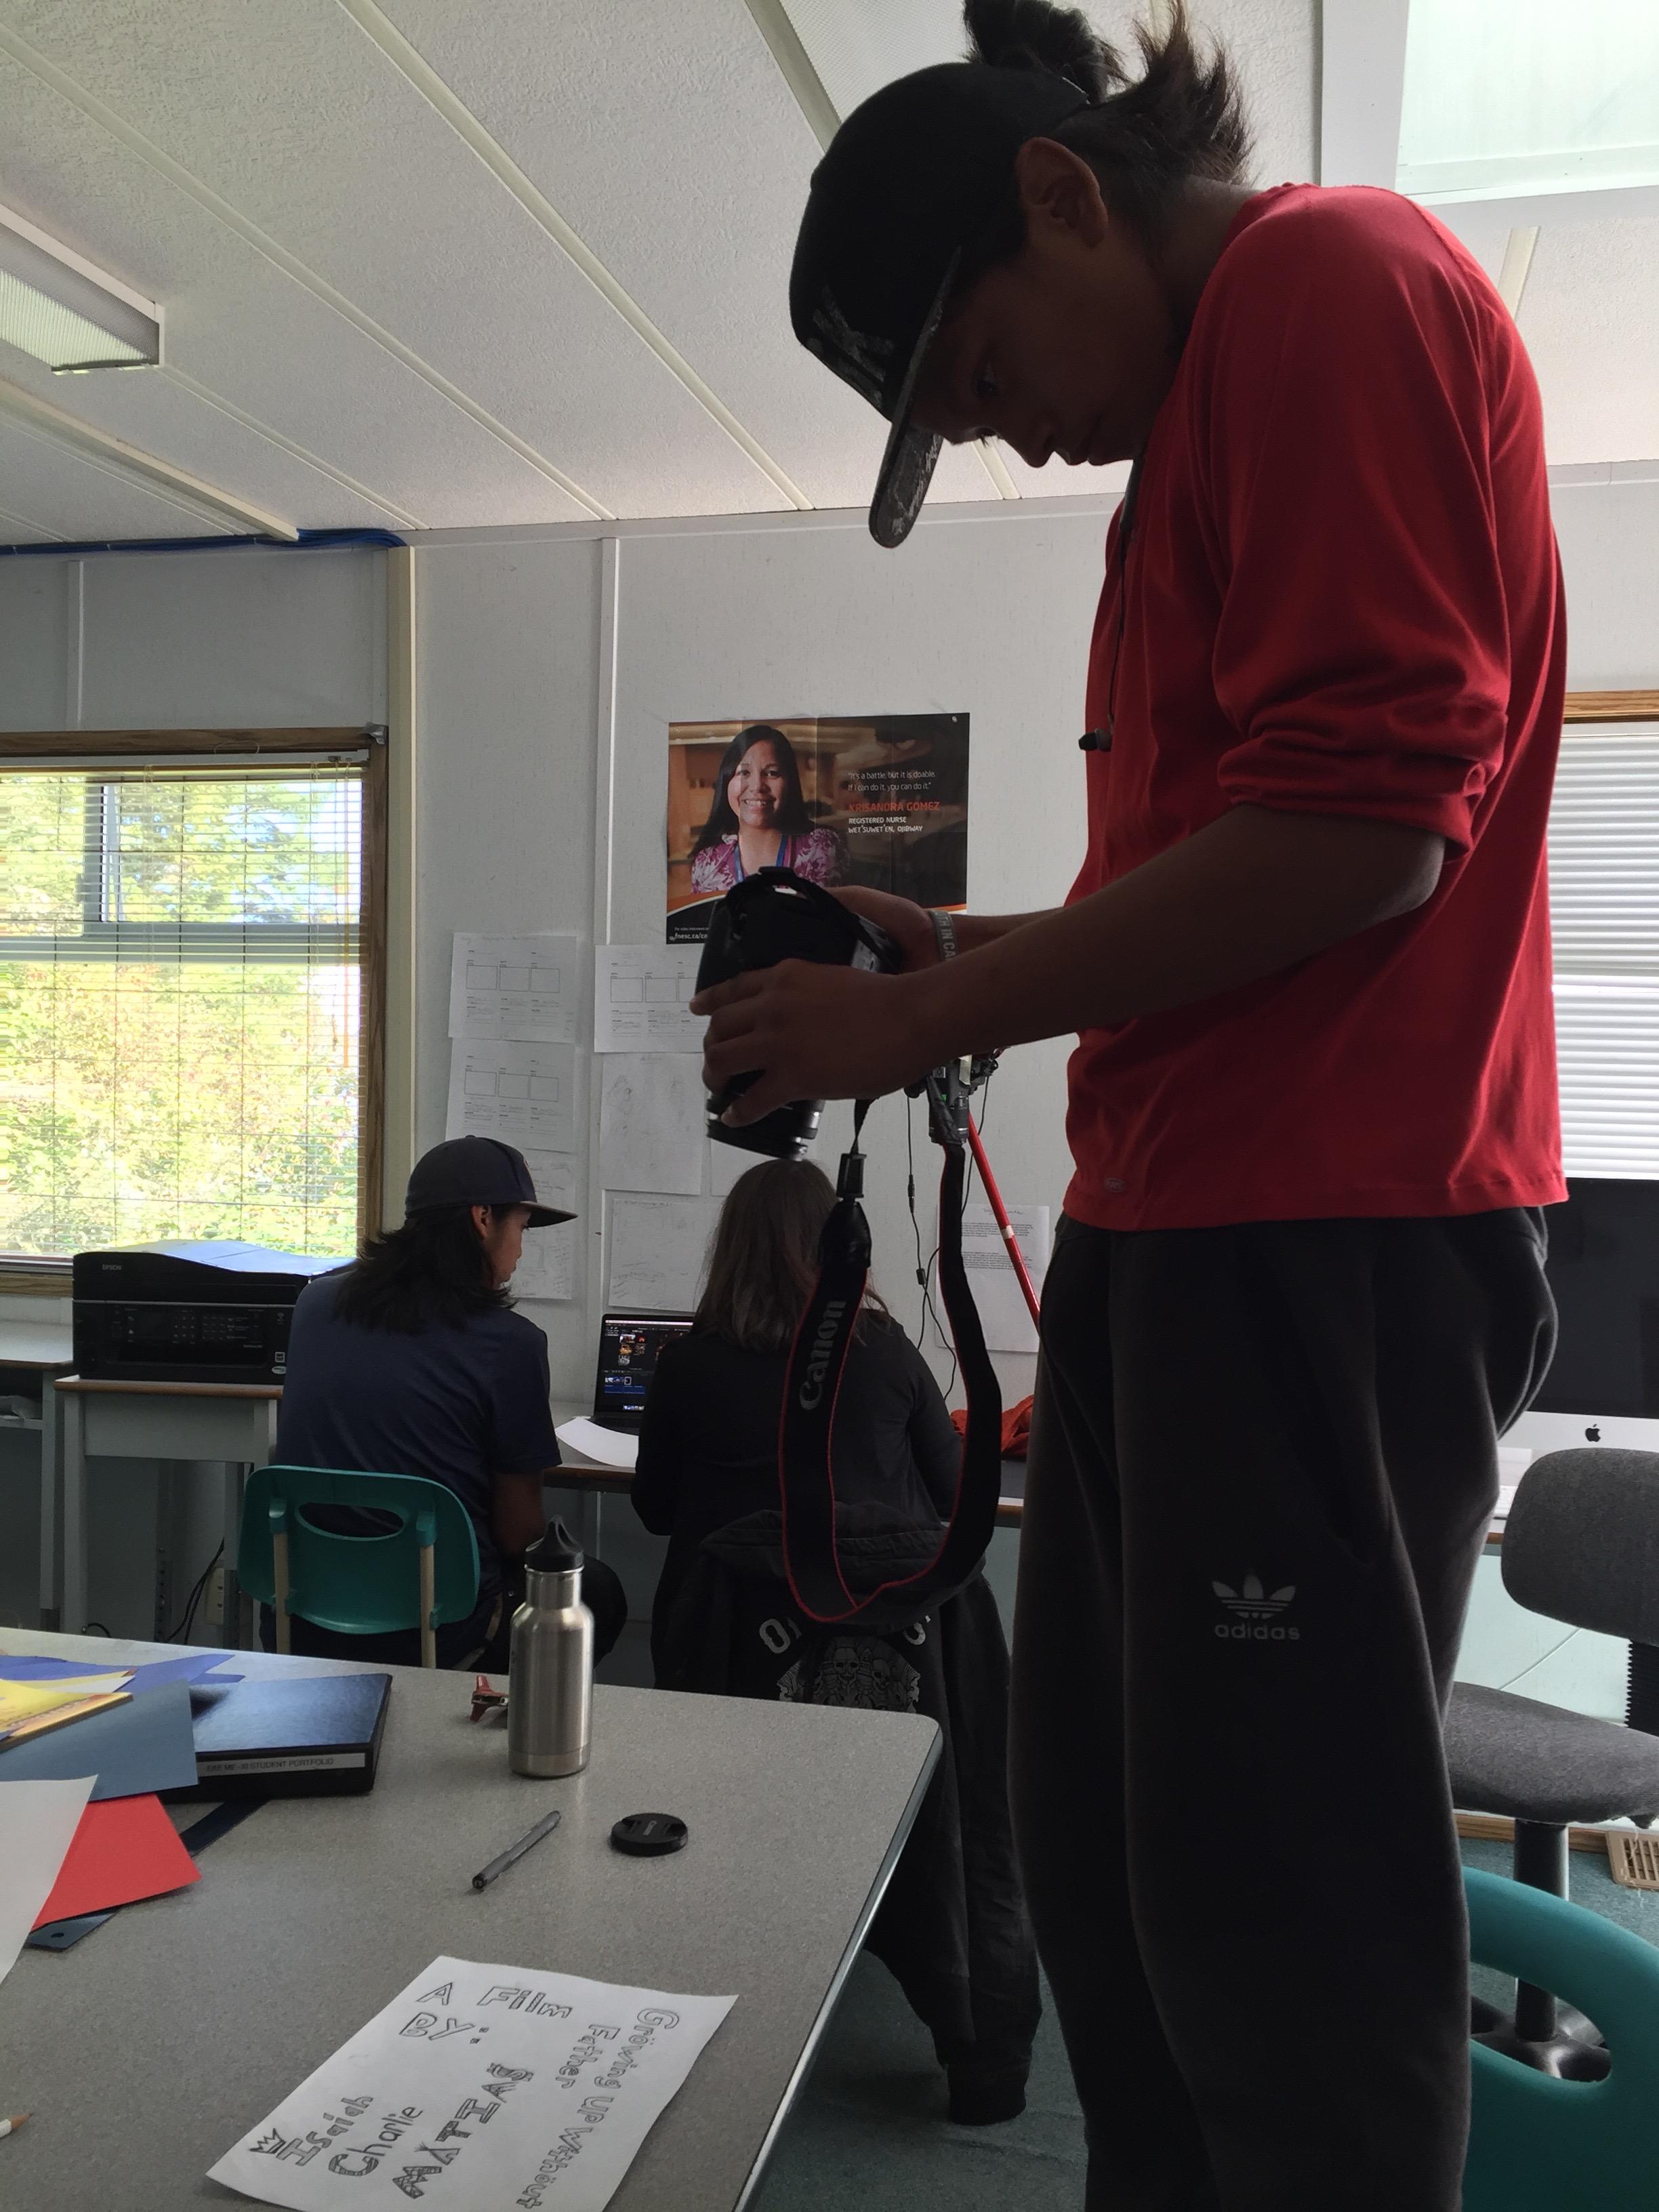 Isaiah photographs his credit artwork.